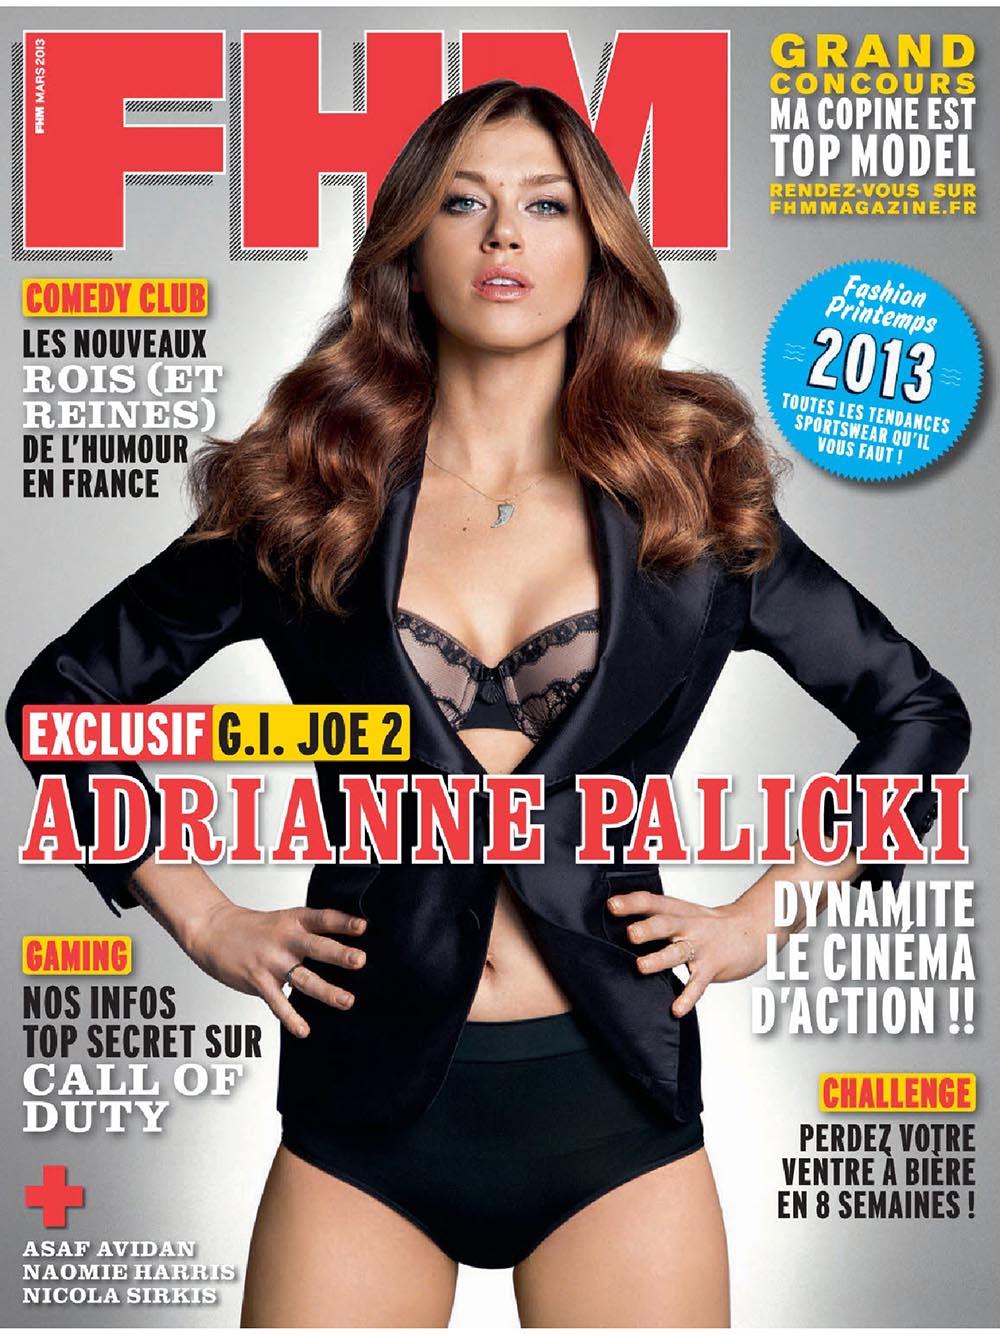 http://3.bp.blogspot.com/-awZSfKZW1KU/US56PTiHdkI/AAAAAAAAZ54/Zr3G7ILBr4g/s1600/Adrianne+Palicki+Sexy+Girl+FHM+France+March+2013.jpg